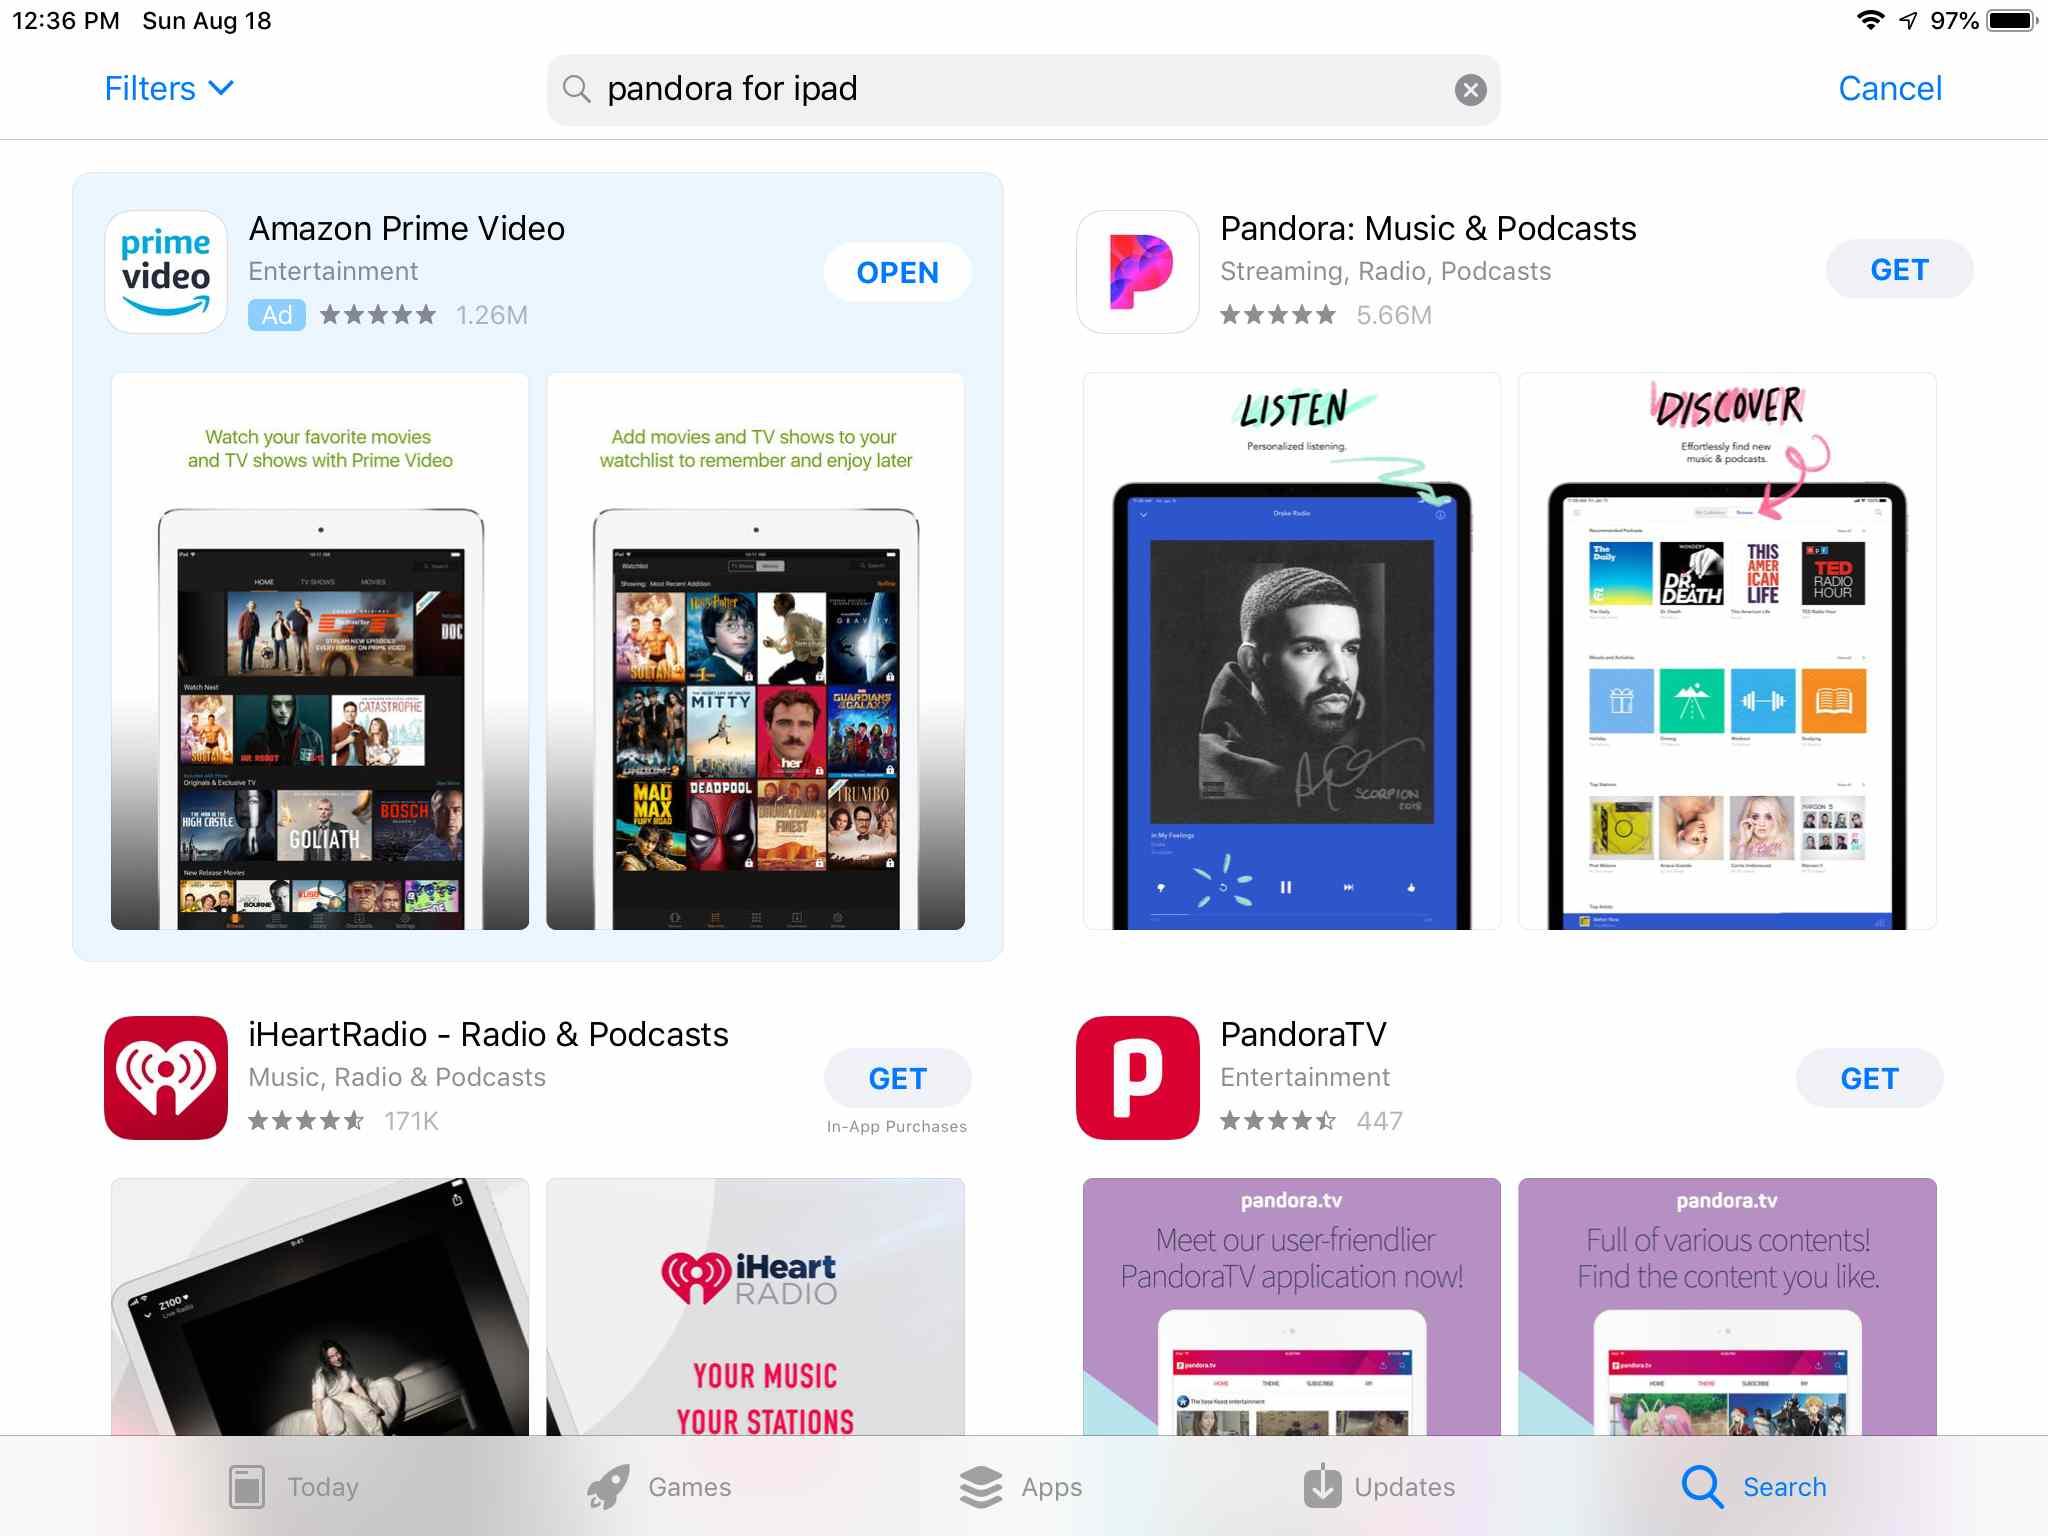 How to Use Pandora Radio on Your iPad